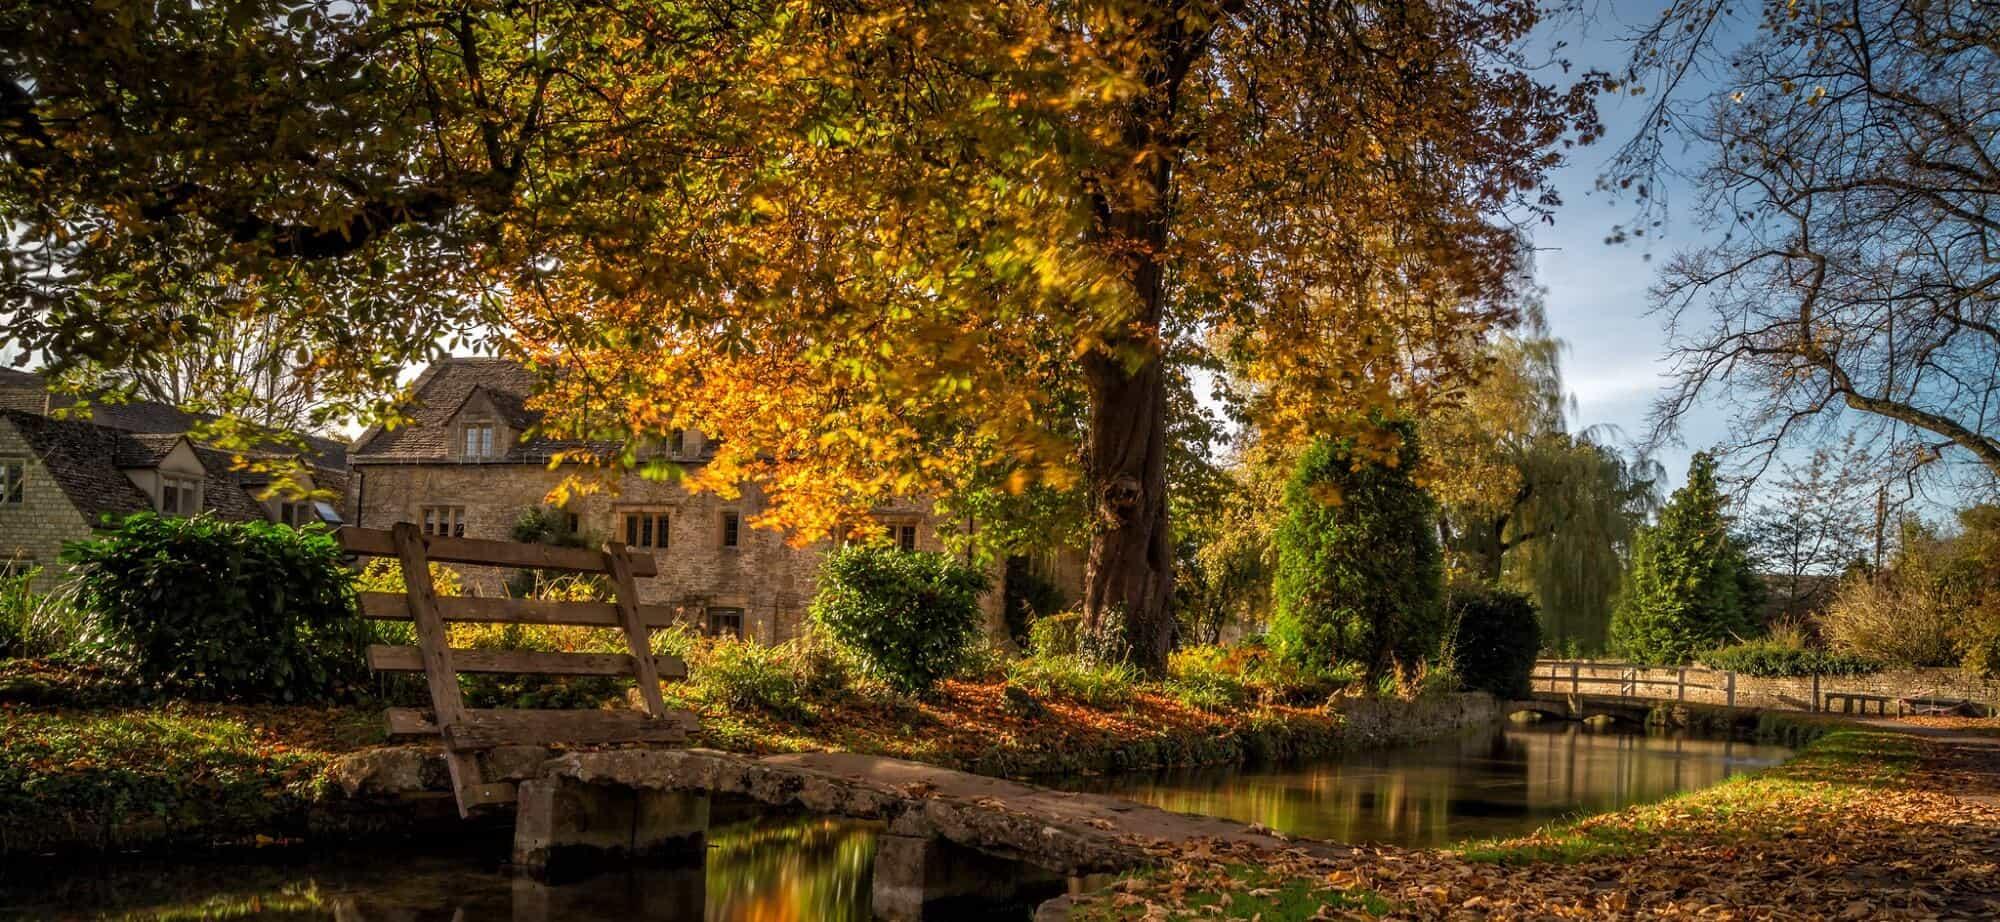 Cotswold Walking Holidays  Scenic Walks  Celtic Trails